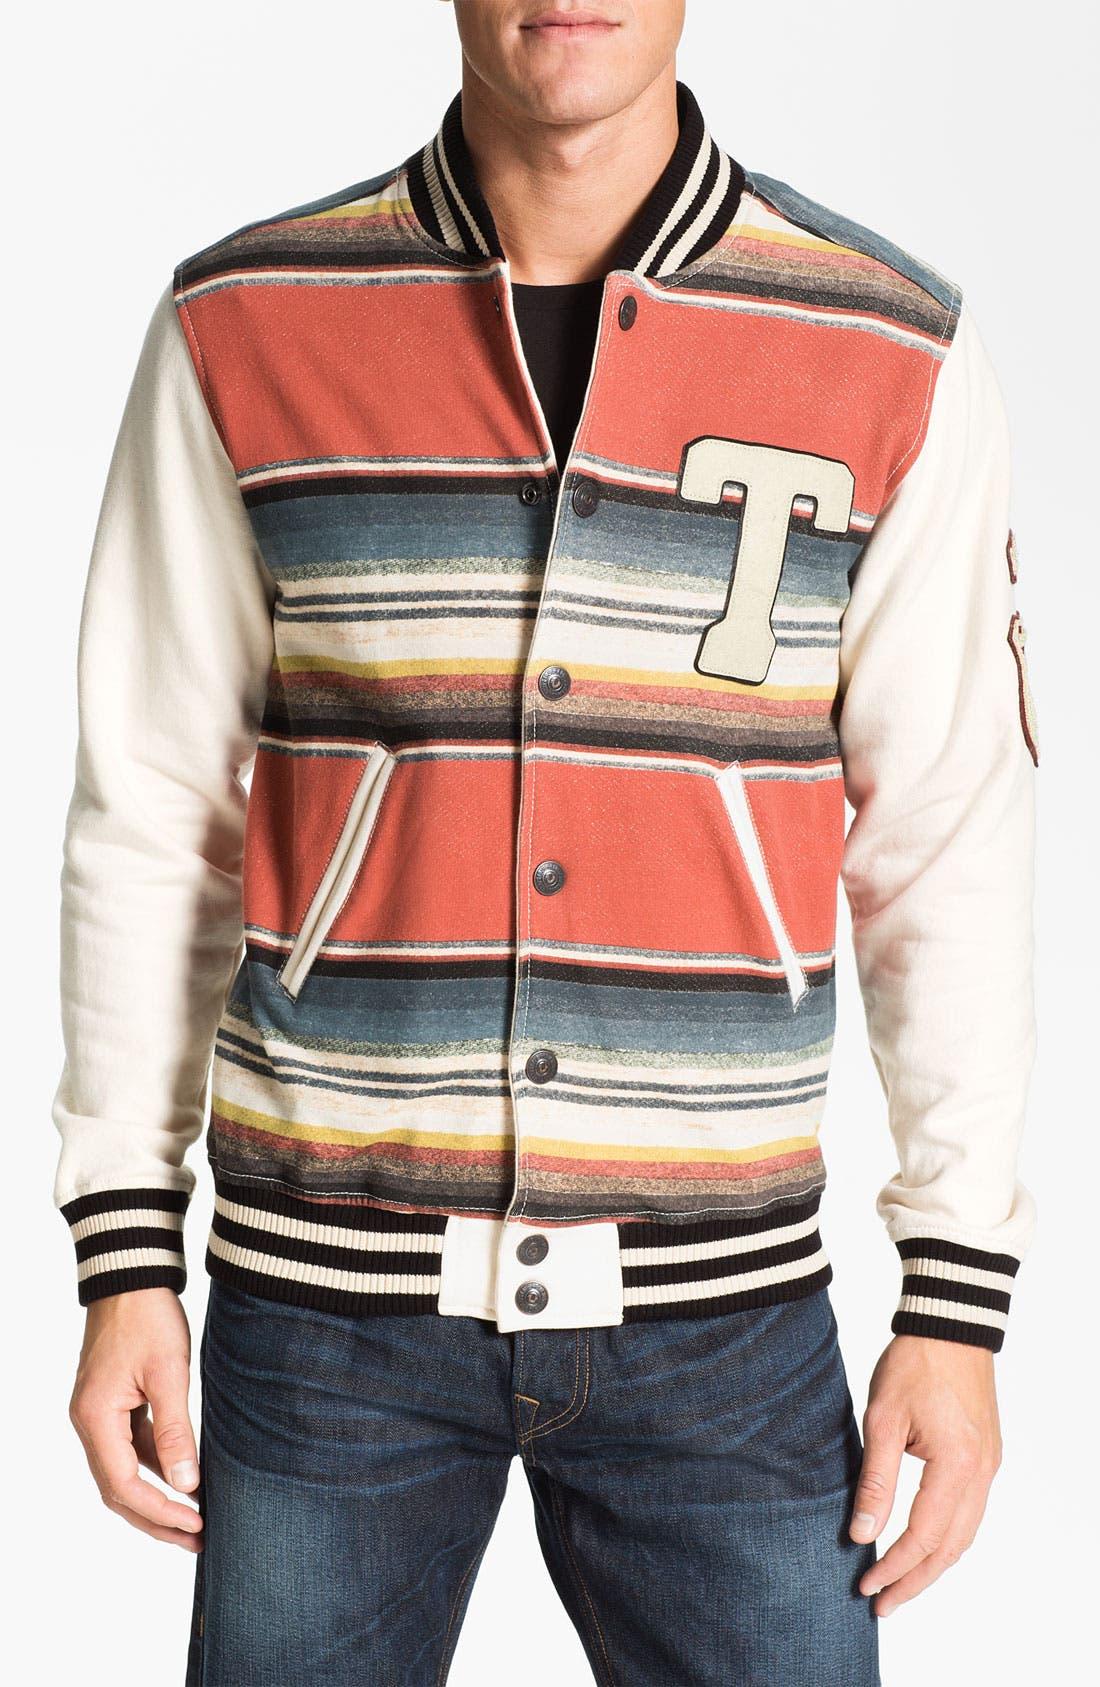 Main Image - True Religion Brand Jeans Stripe Print Varsity Jacket